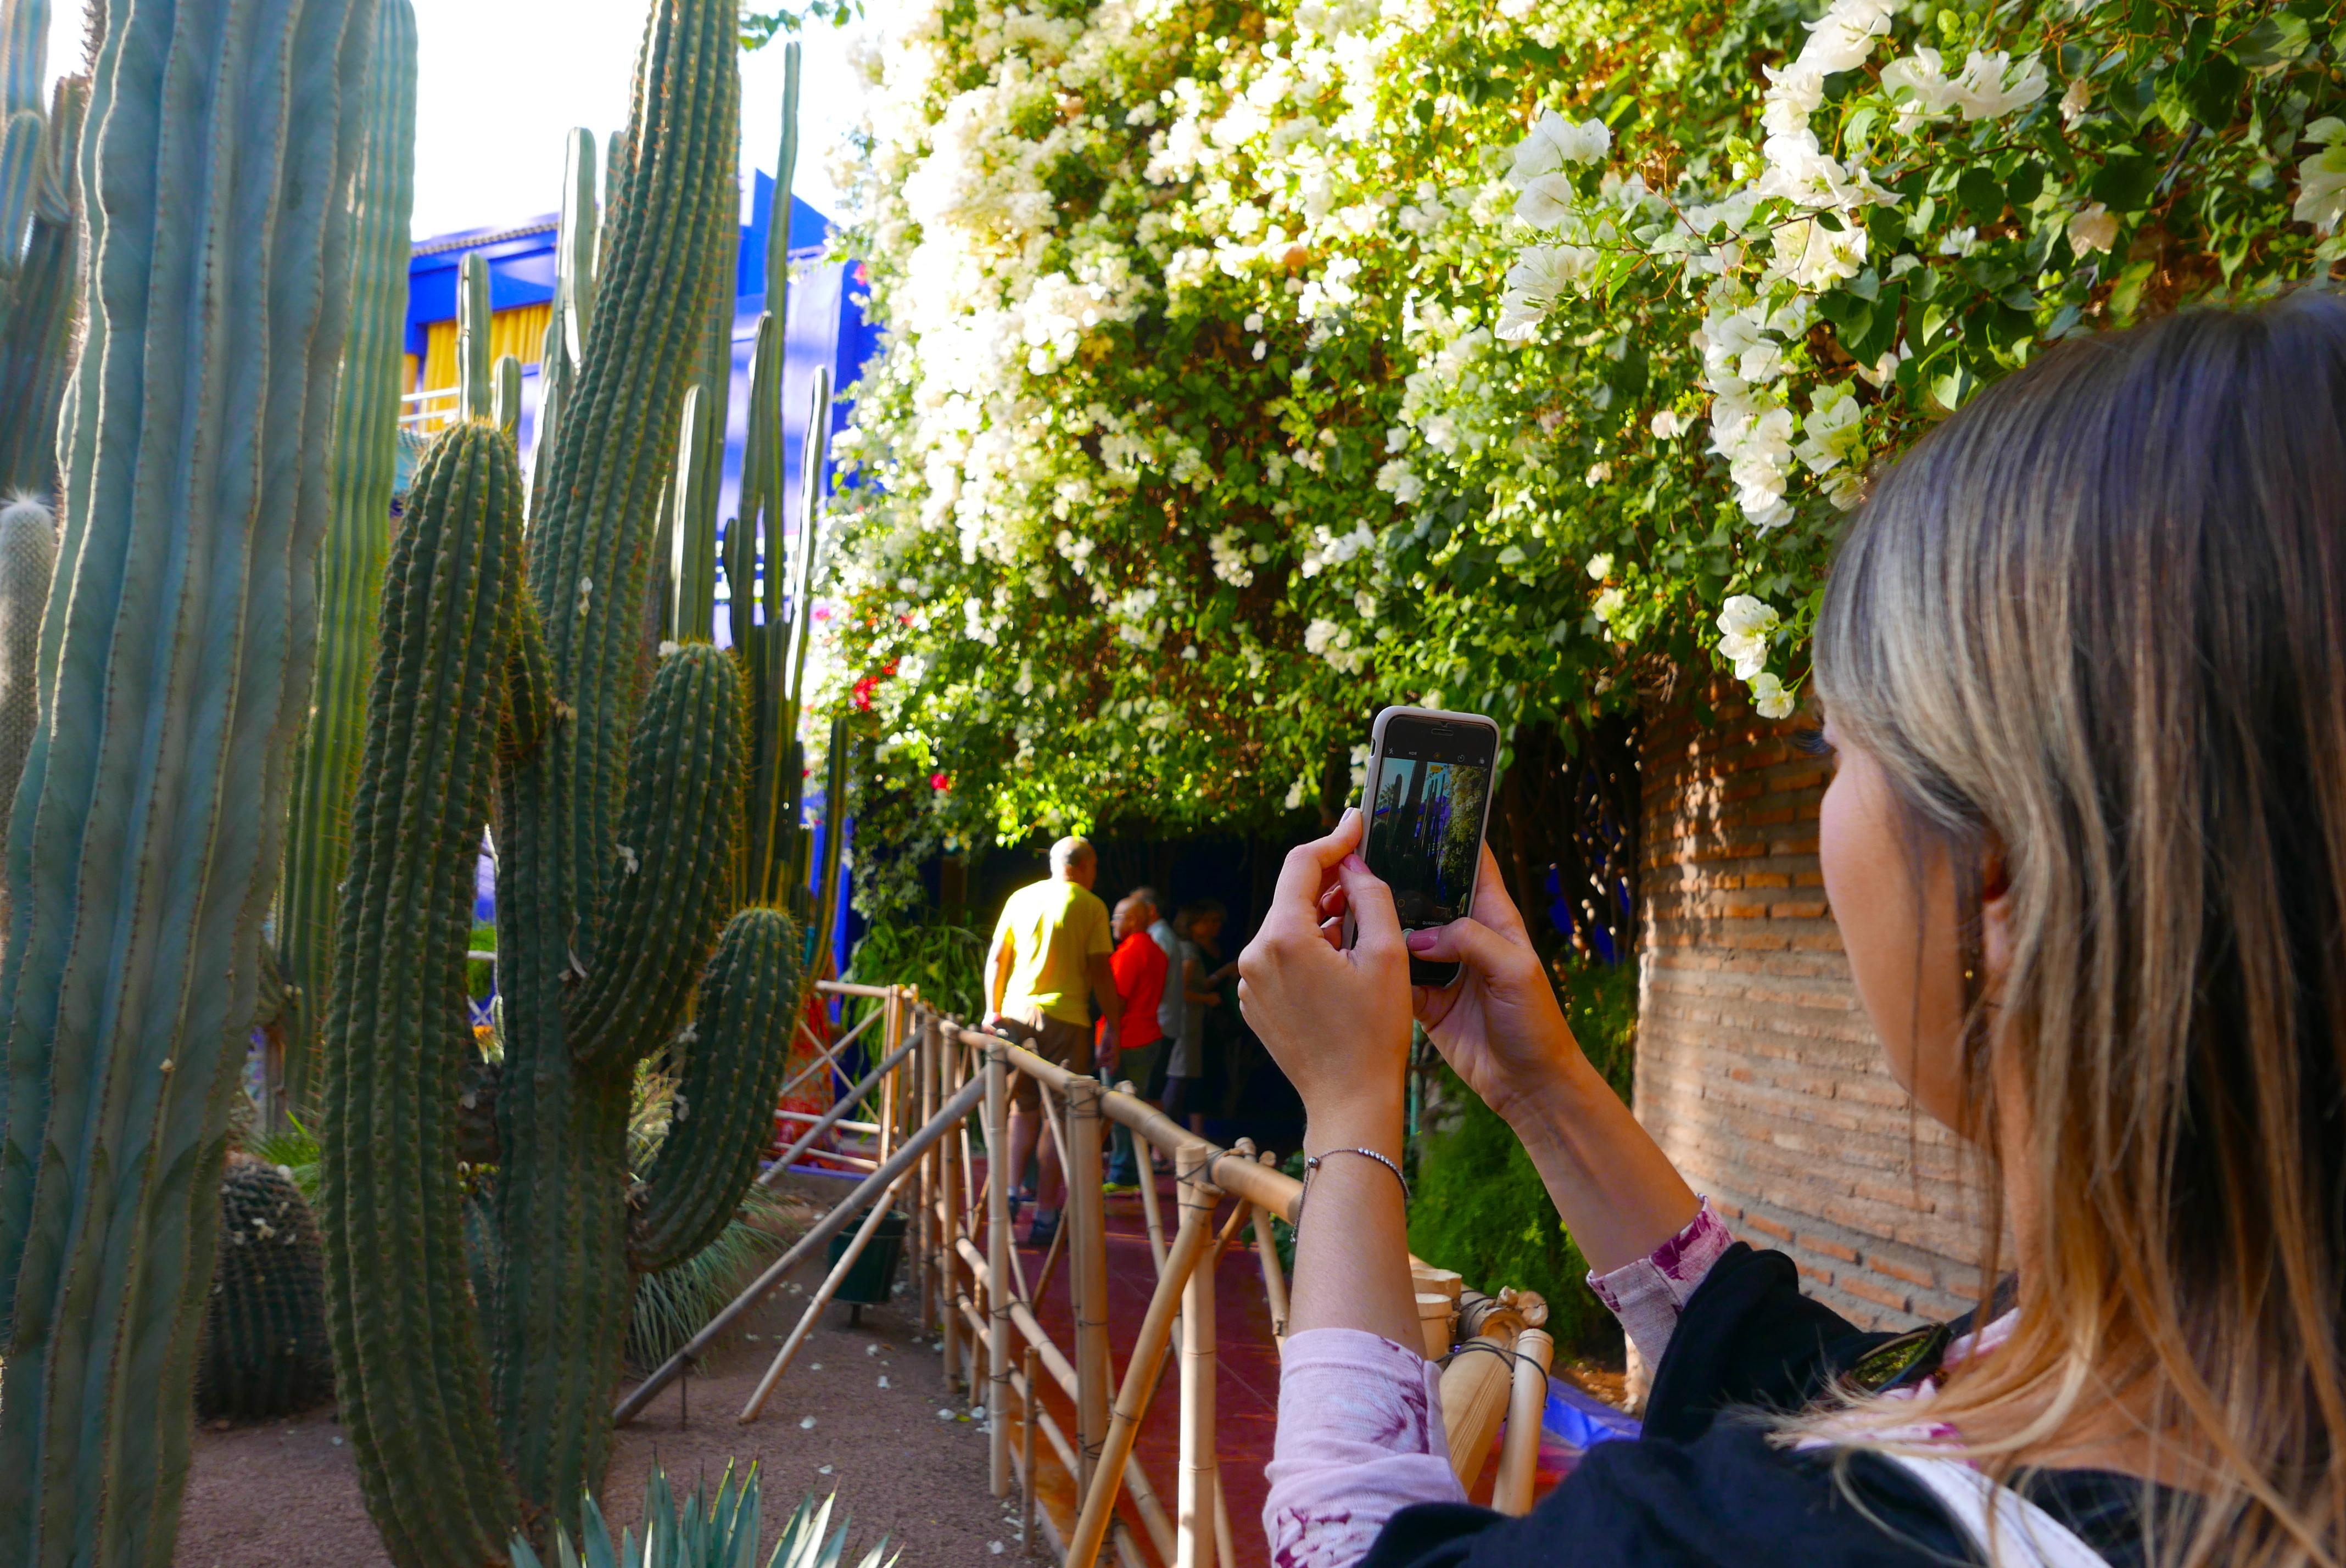 Taylise Fernandes registra imagens da visita aos jardins que pertencem ao Museu YSL